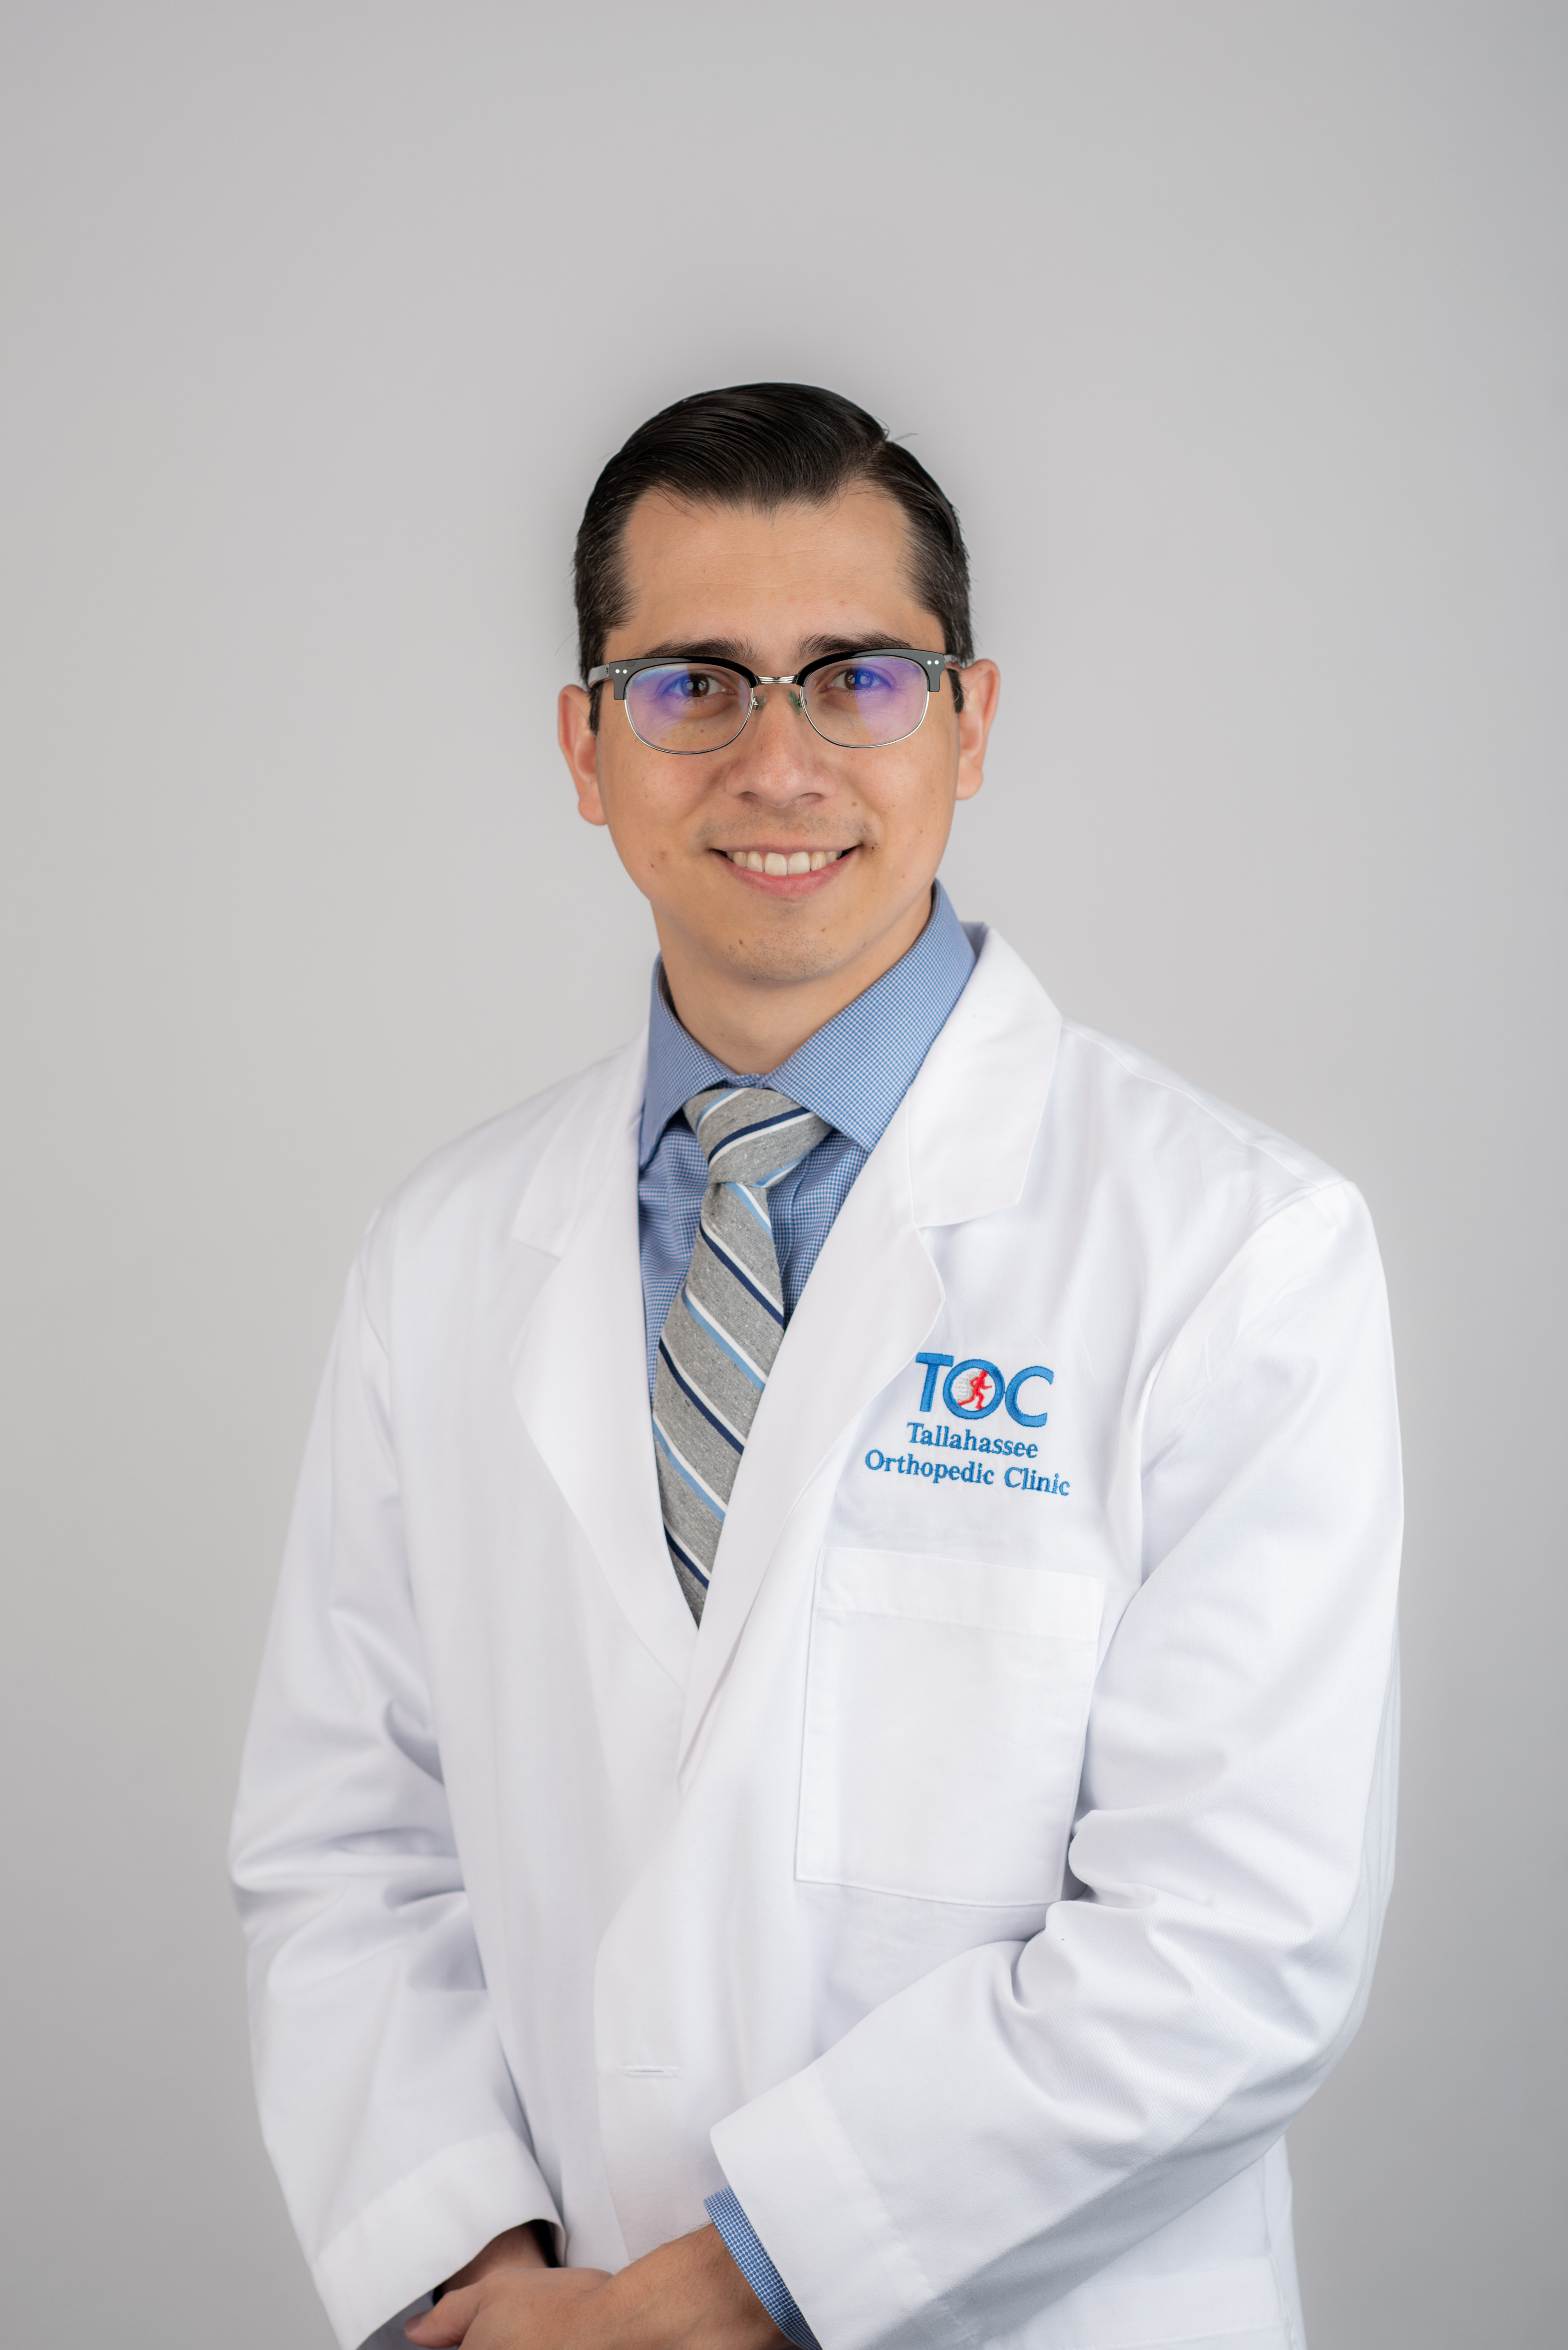 David Alvarez, M.D.